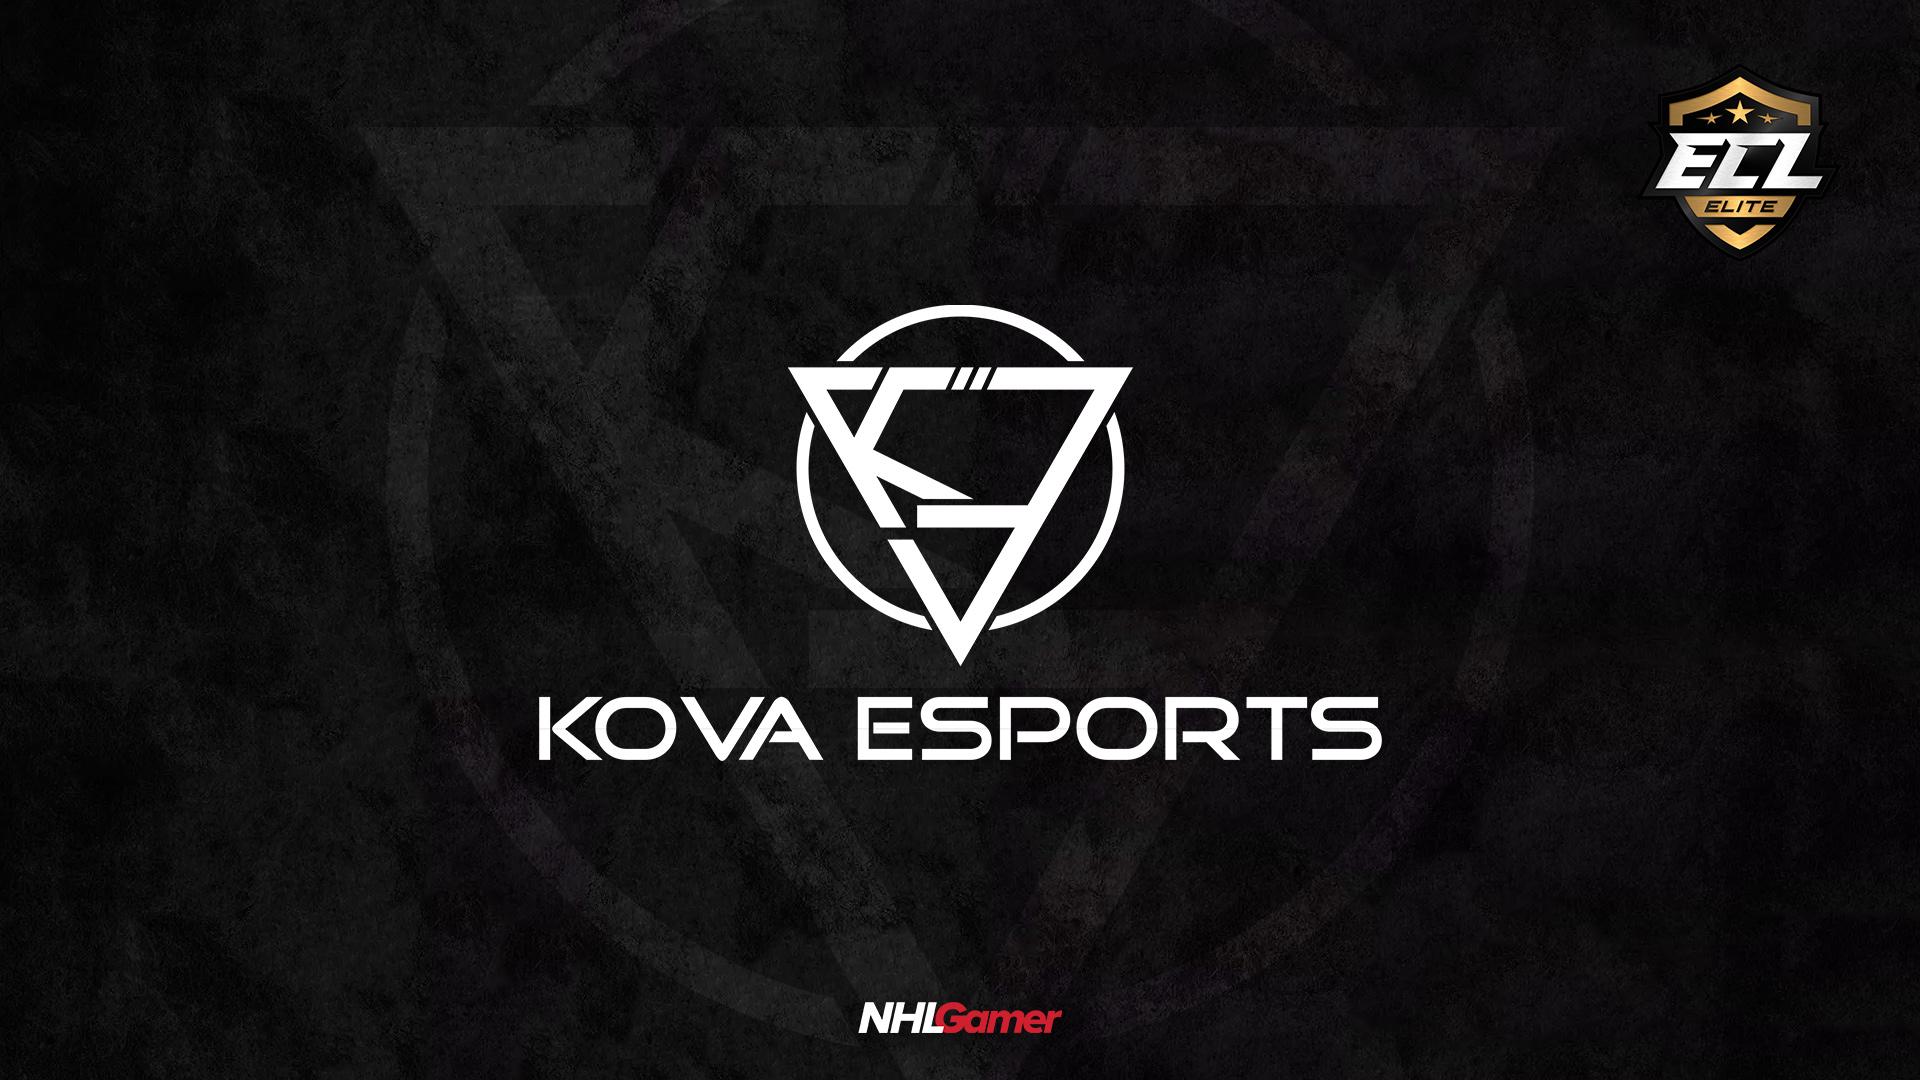 Kova Esports